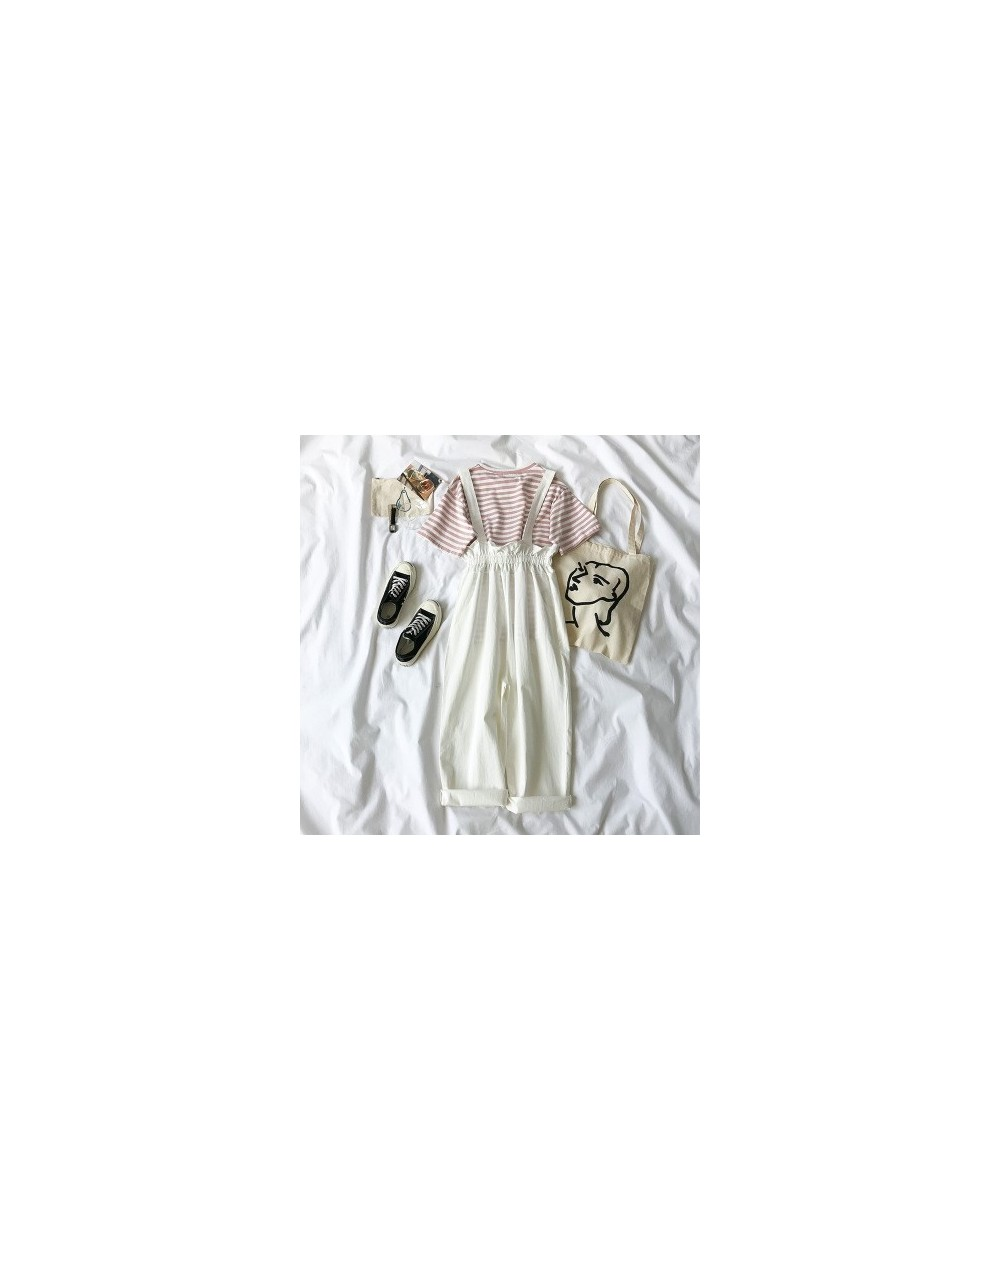 2 piece set women Summer Pants Set Women Striped T-shirt + Fashion Overall White Khaki Pants Outfits For Women Casual plus s...